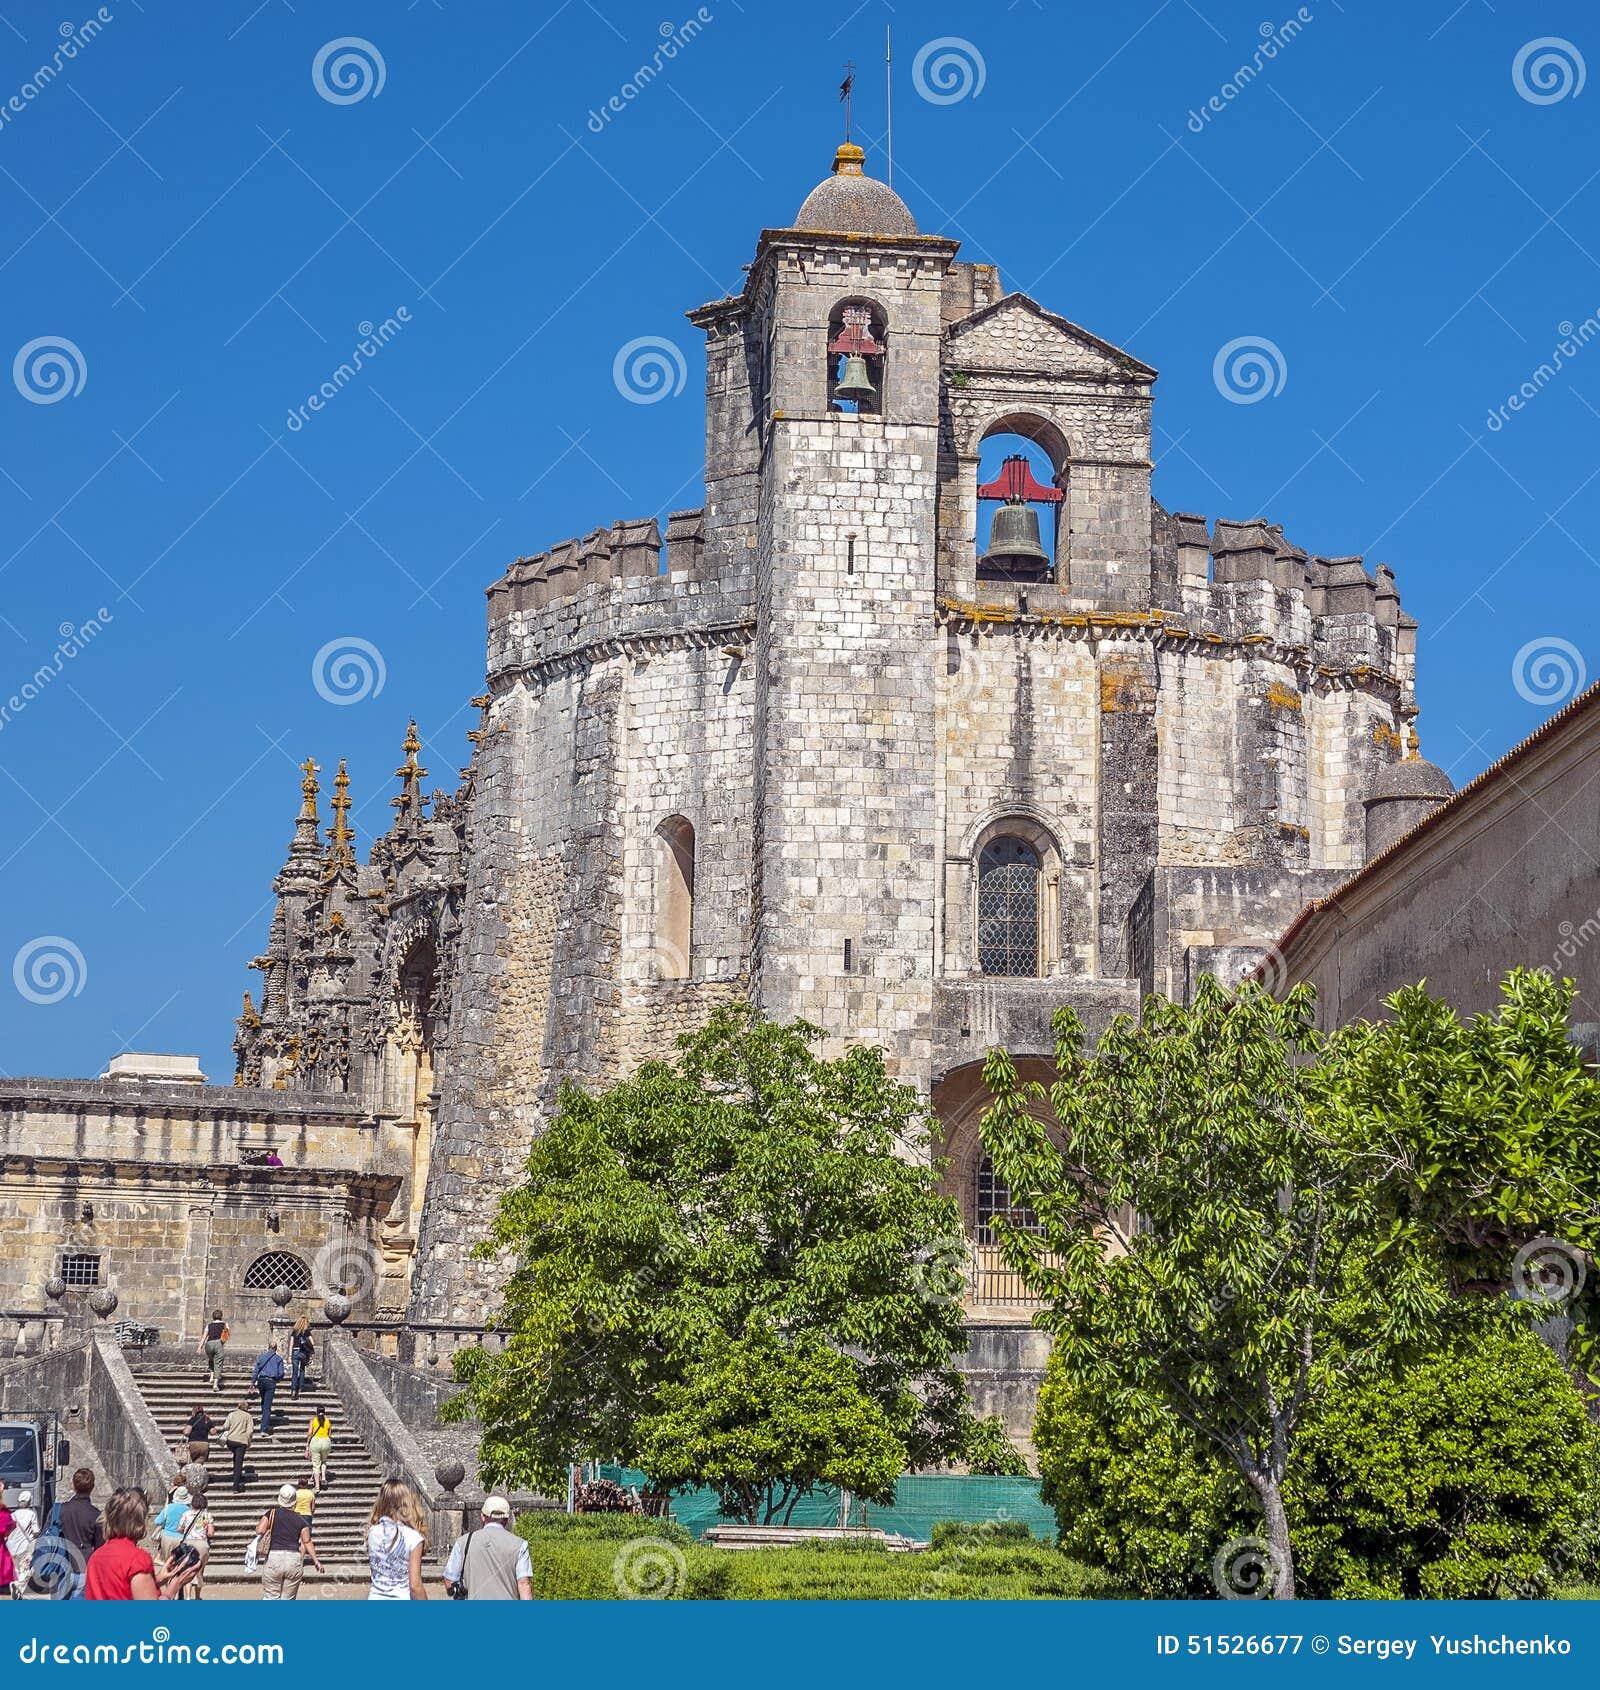 Portugal, Tomar, monasterio de la orden de Cristo